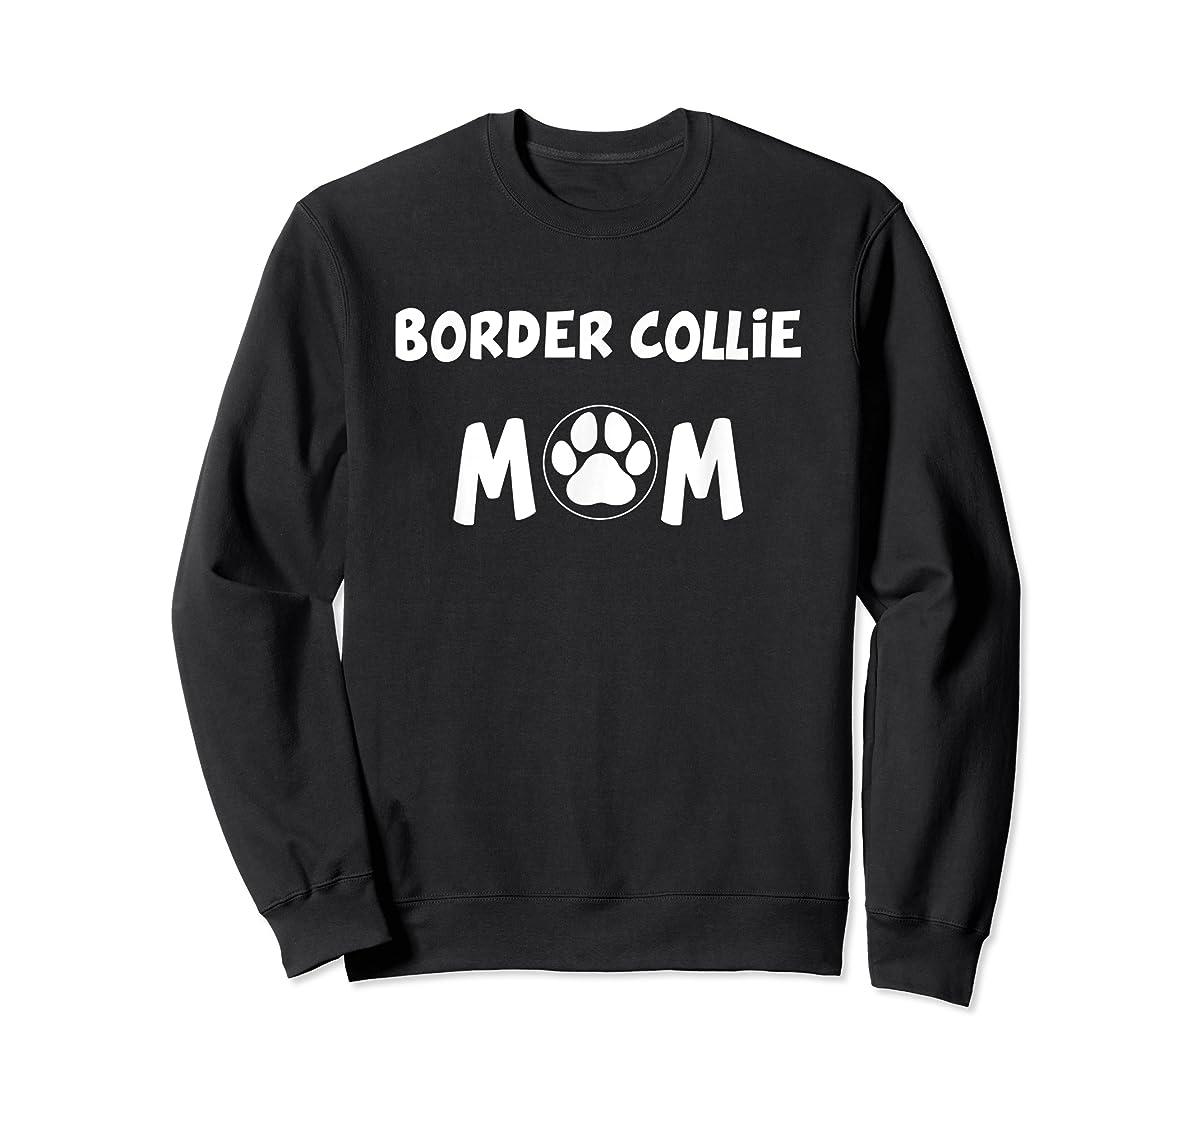 Perfect Dog Mother Gift | Border Collie Mom T-Shirt-Sweatshirt-Black